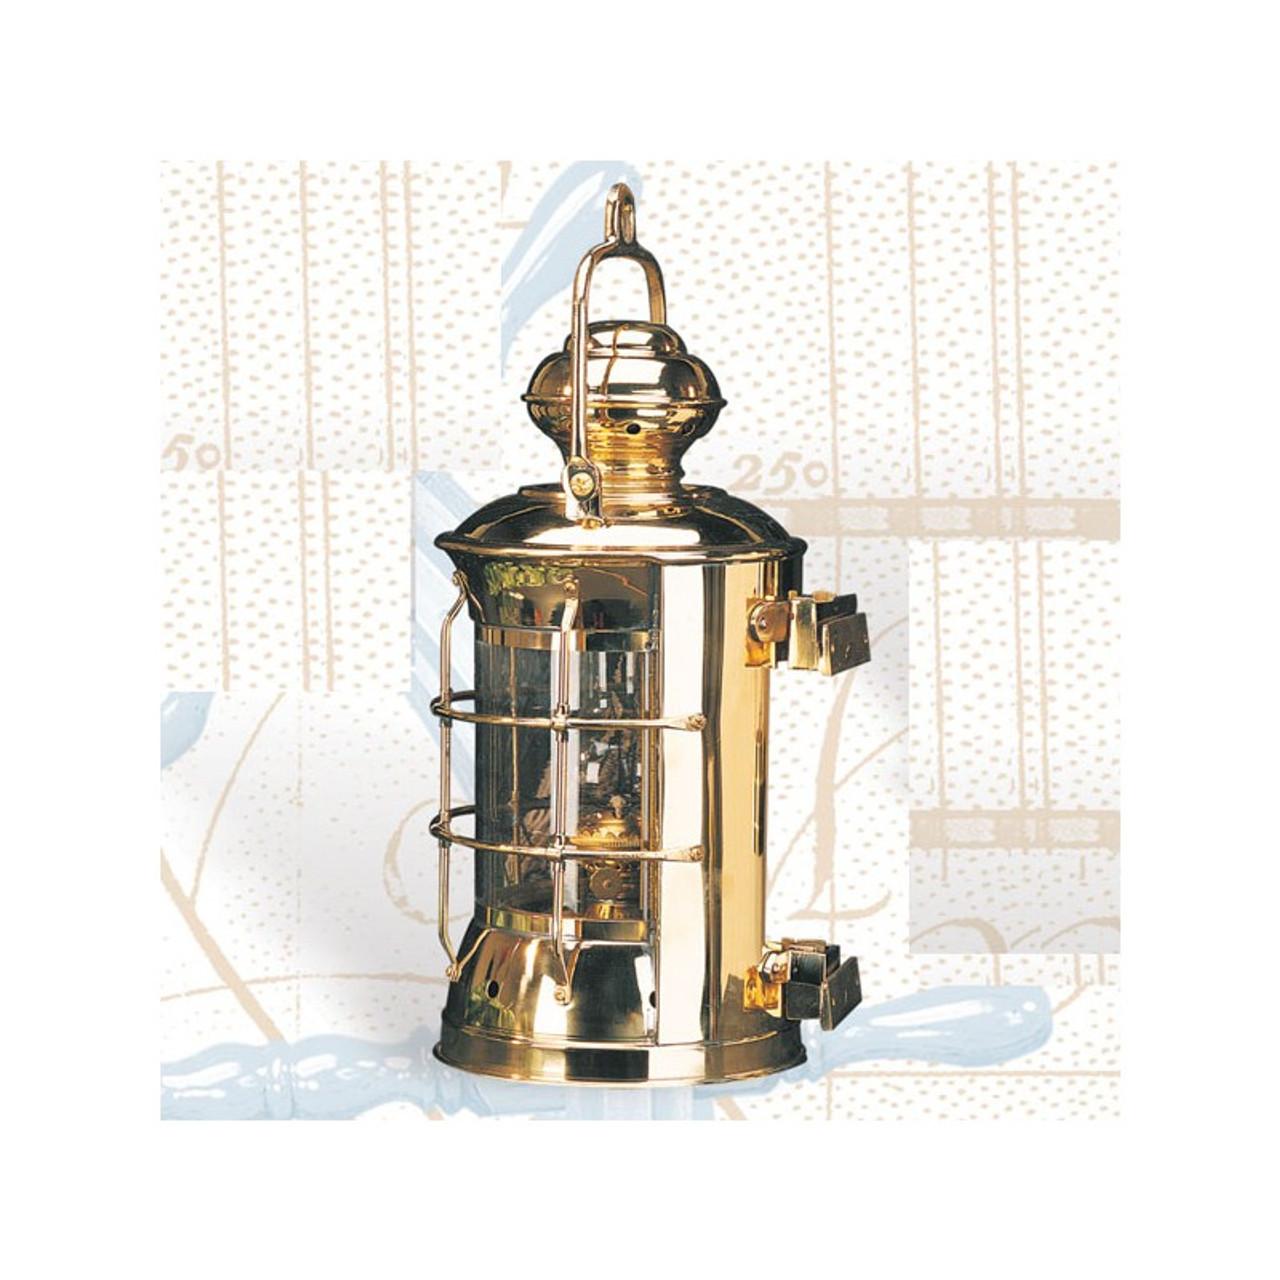 "(BL-841 Electric) 14.5"" Brass Masthead Electric Lantern"